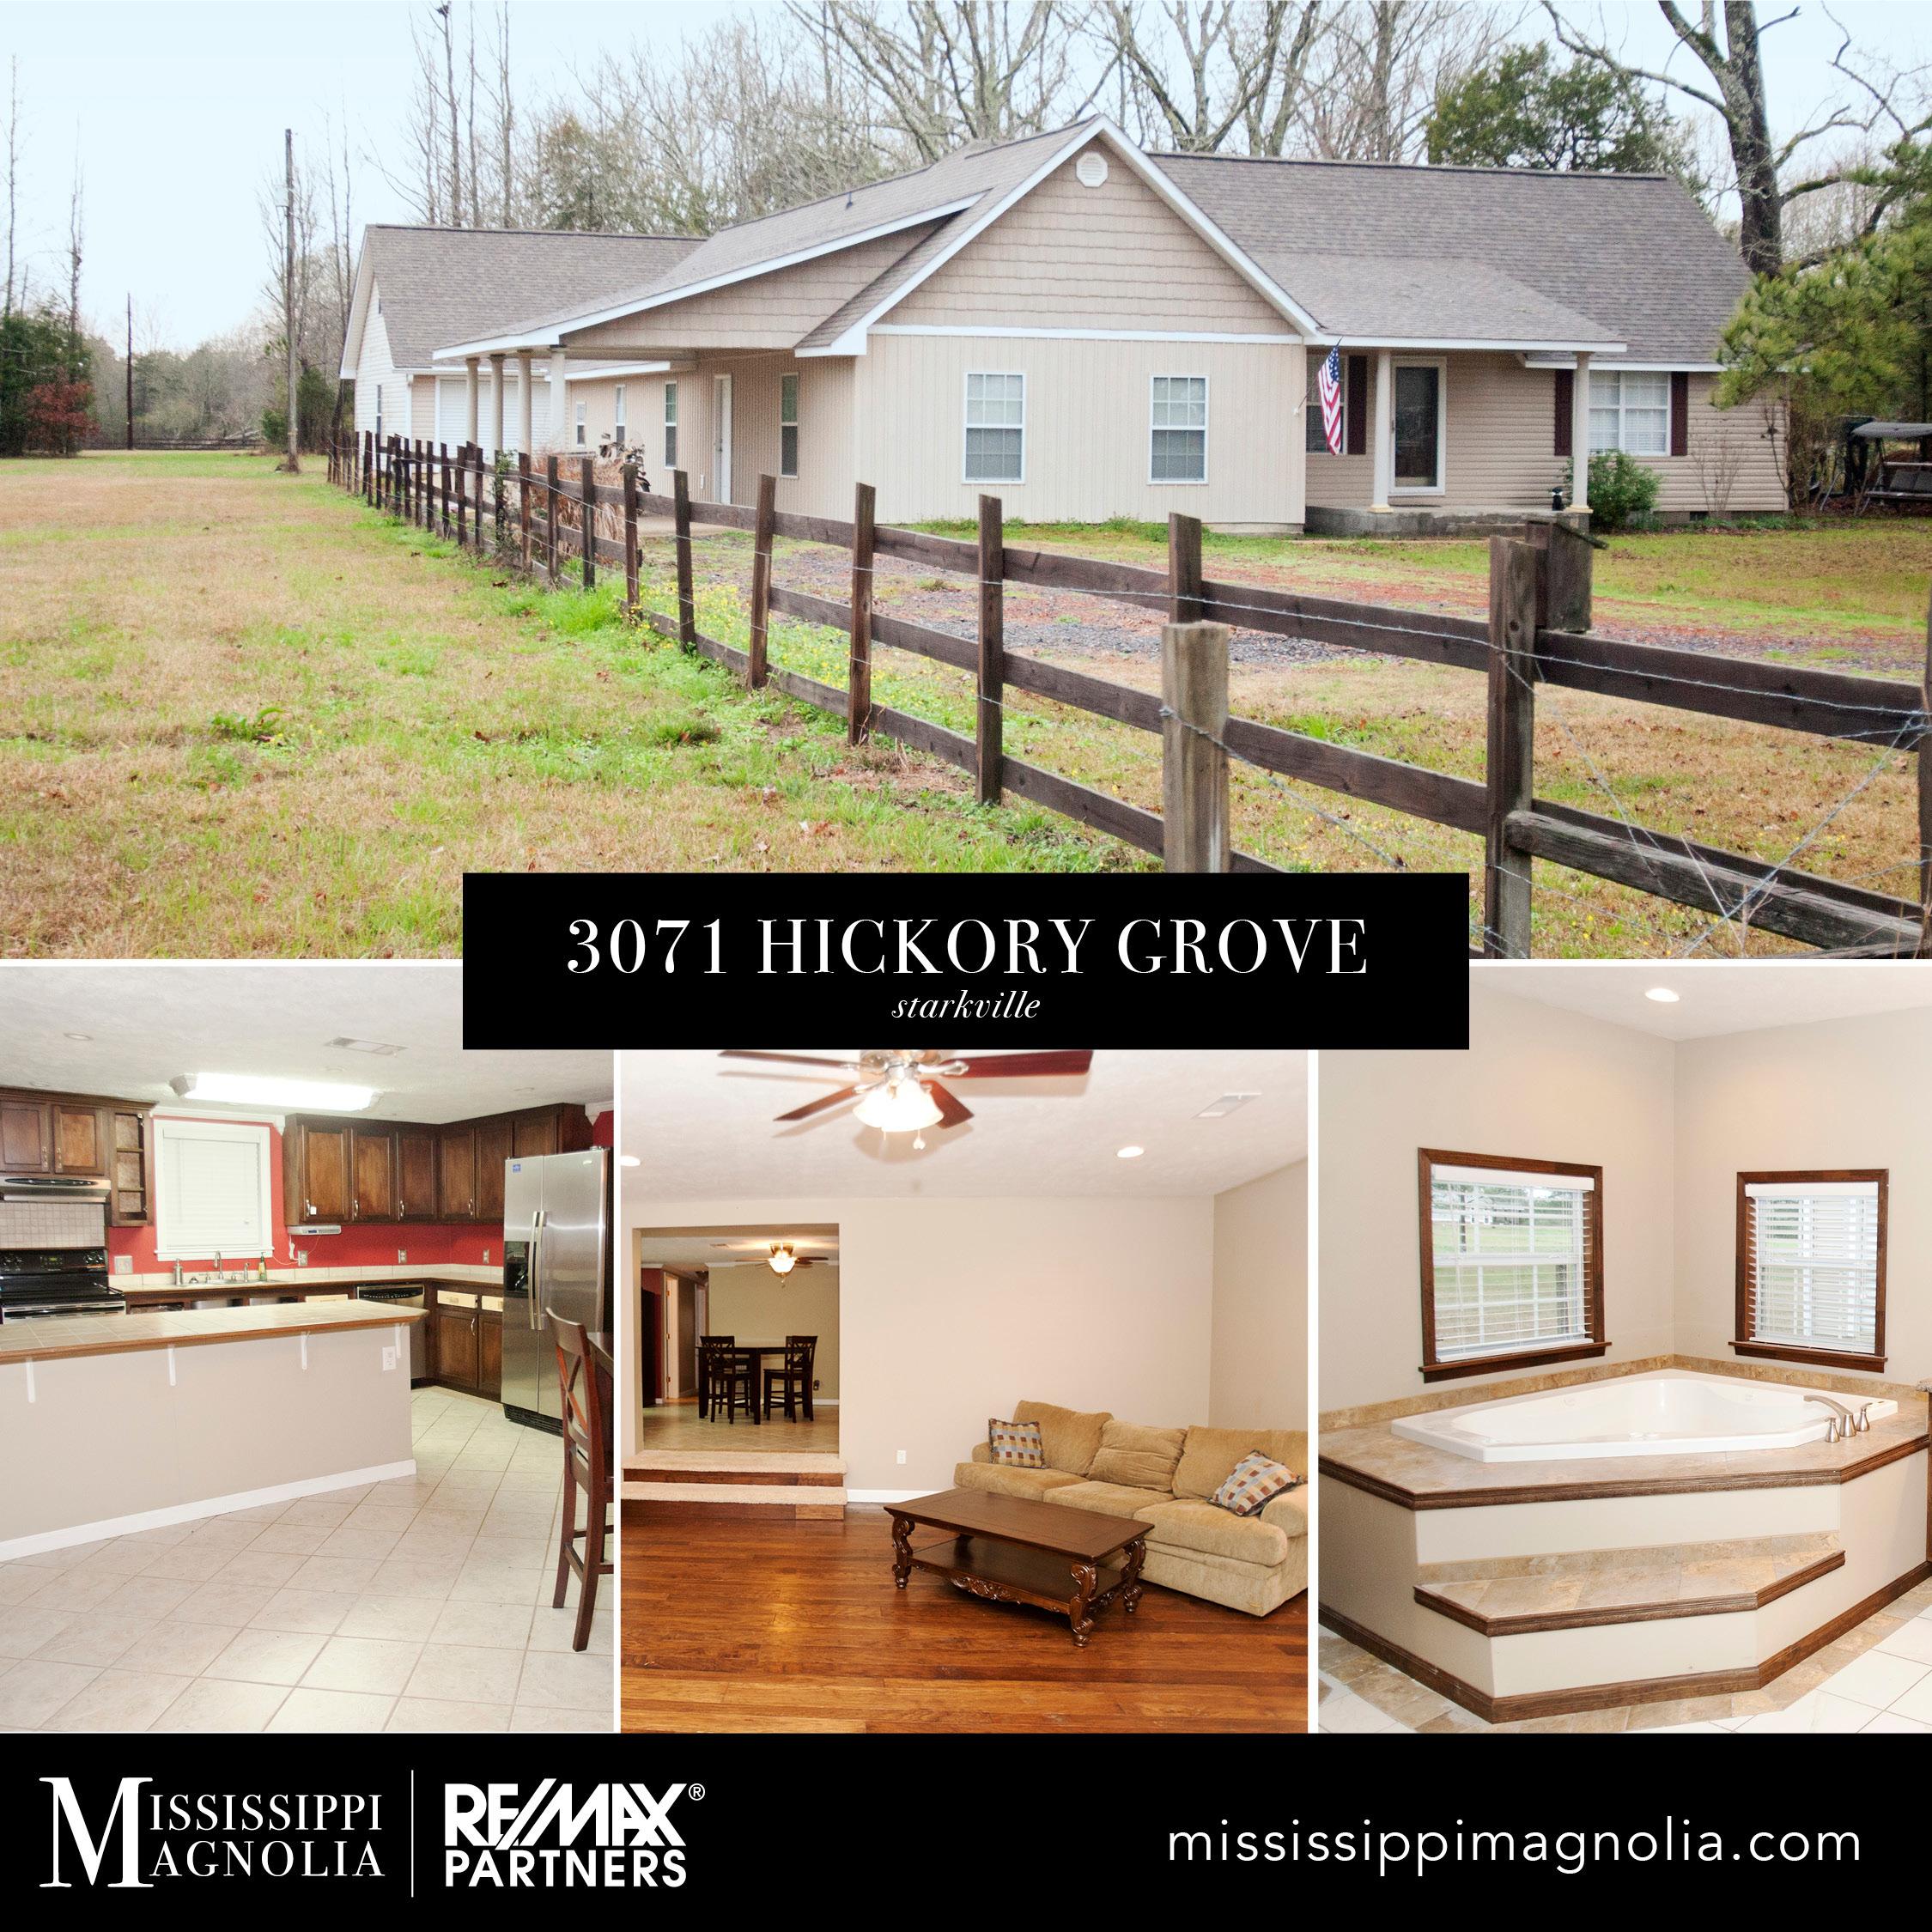 3071 Hickory Grove, Starkville, MS 39759